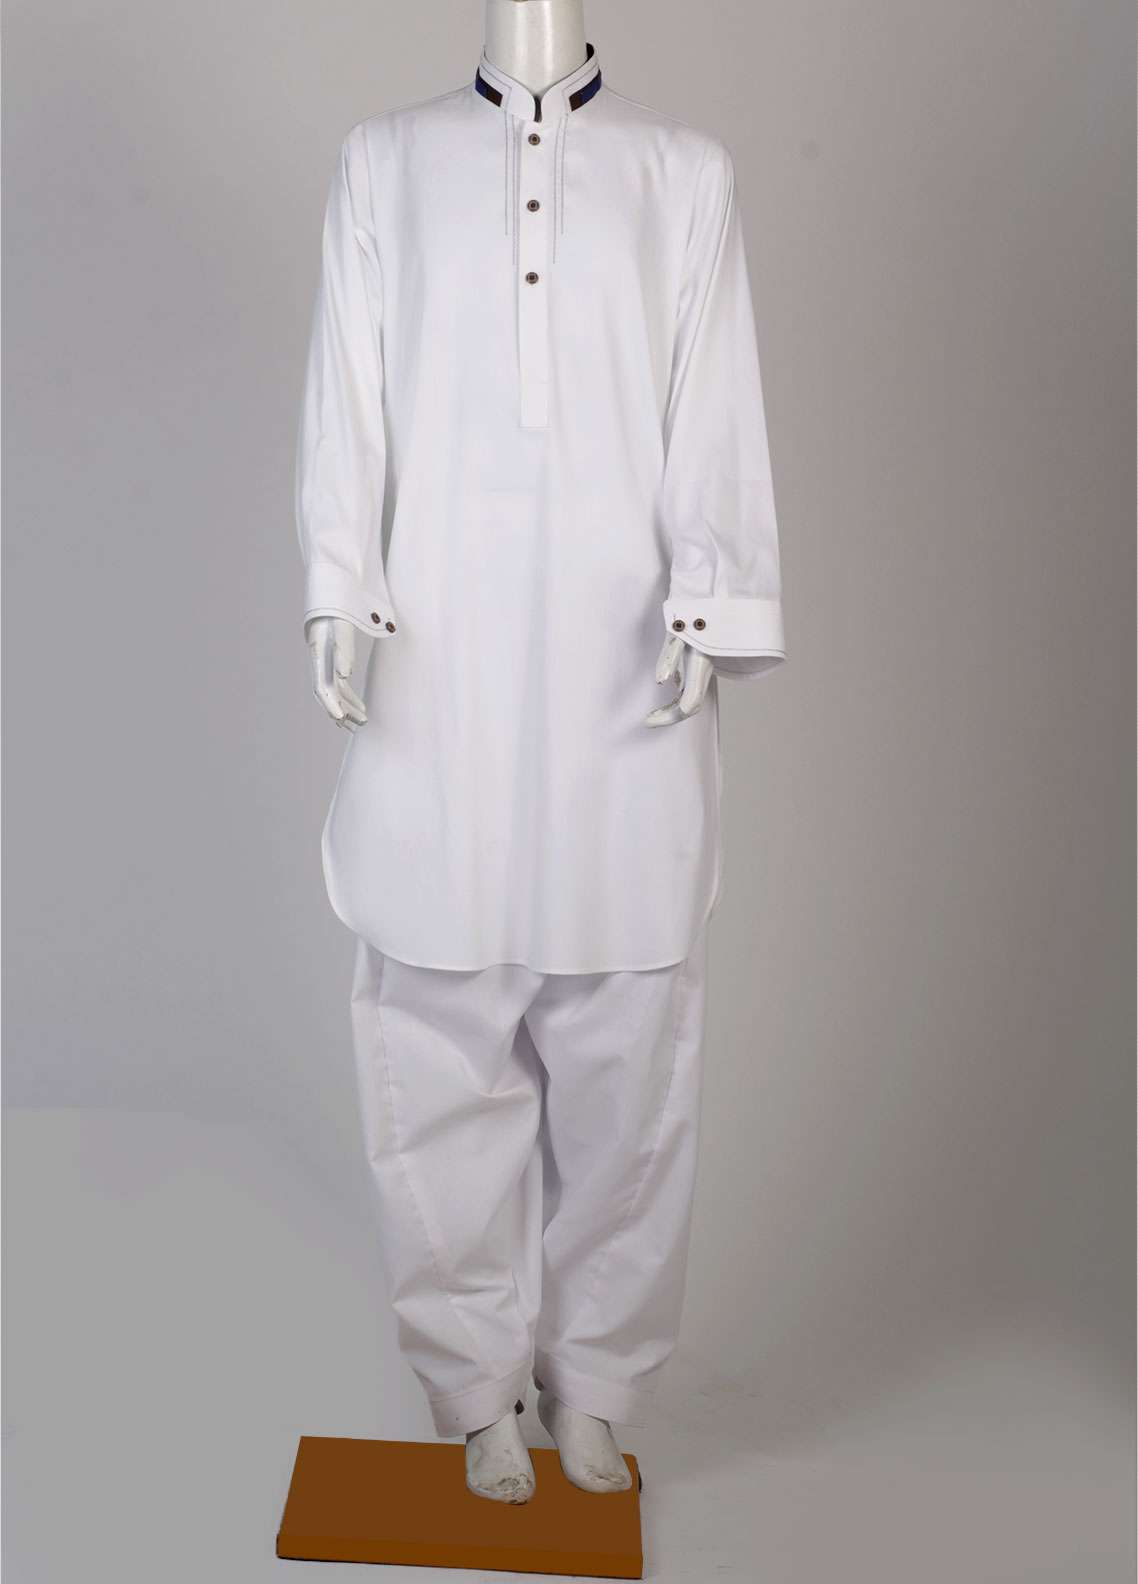 Aizaz Zafar Cotton Fancy Suits for Boys - White AZ18B 014